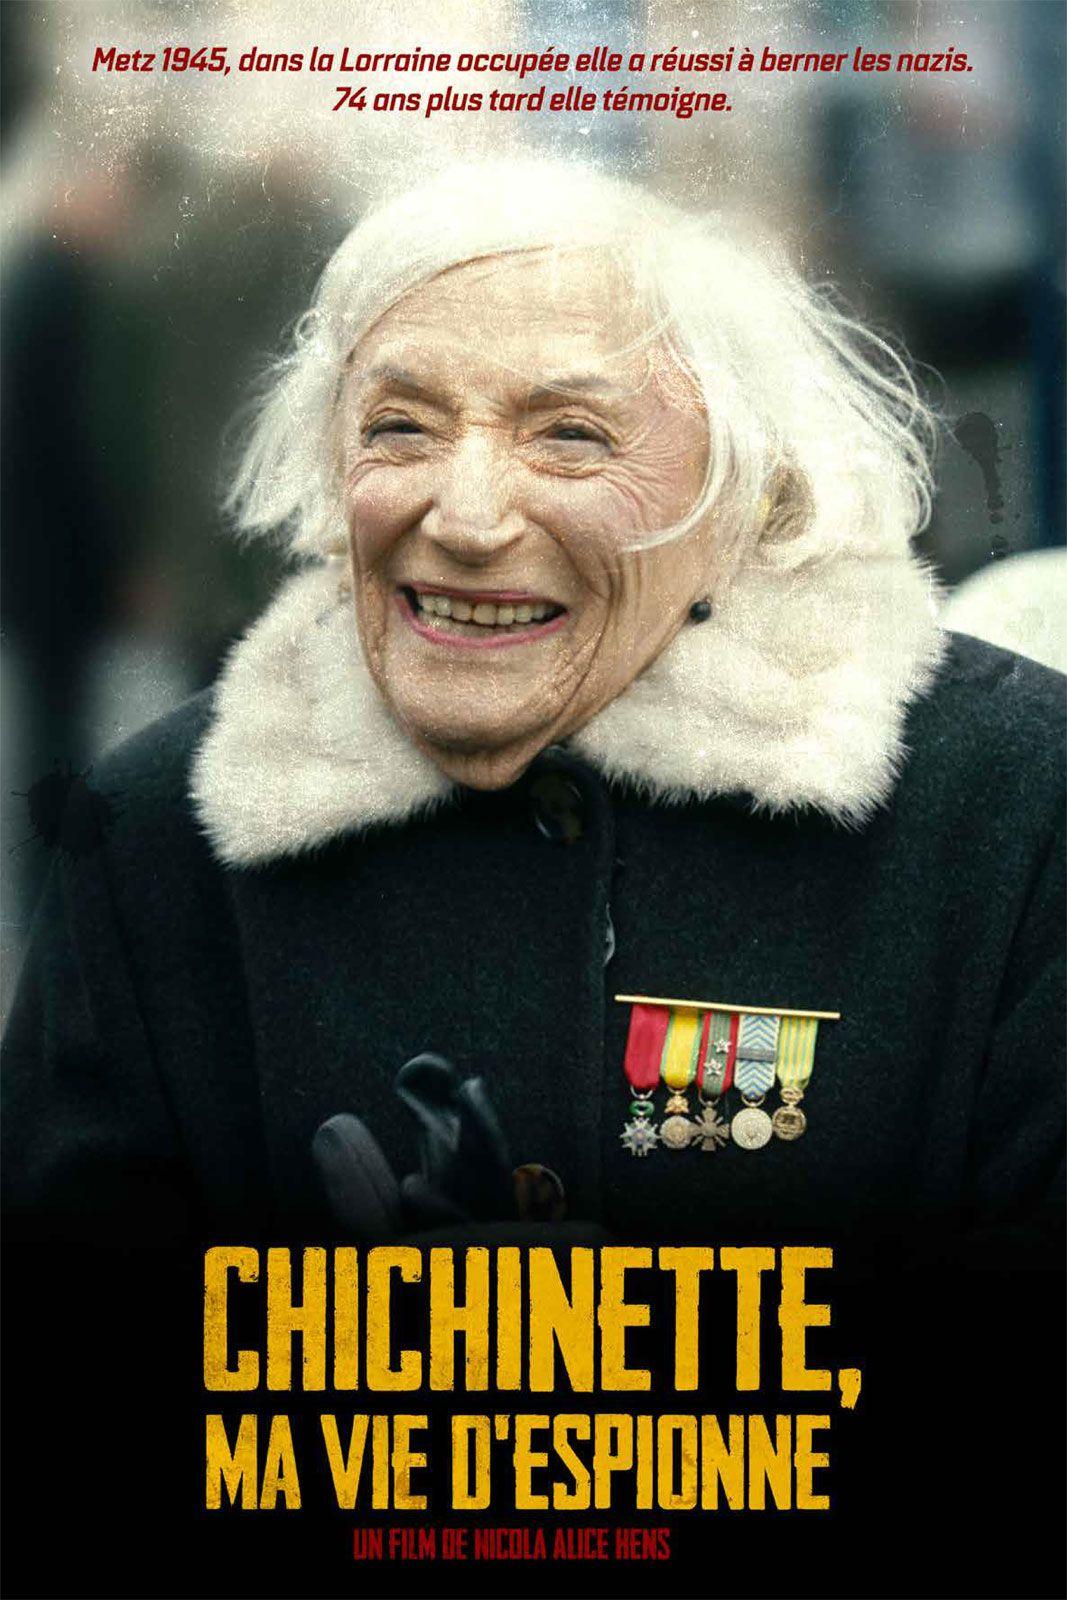 Chichinette, ma vie d'espionne - Documentaire (2019)